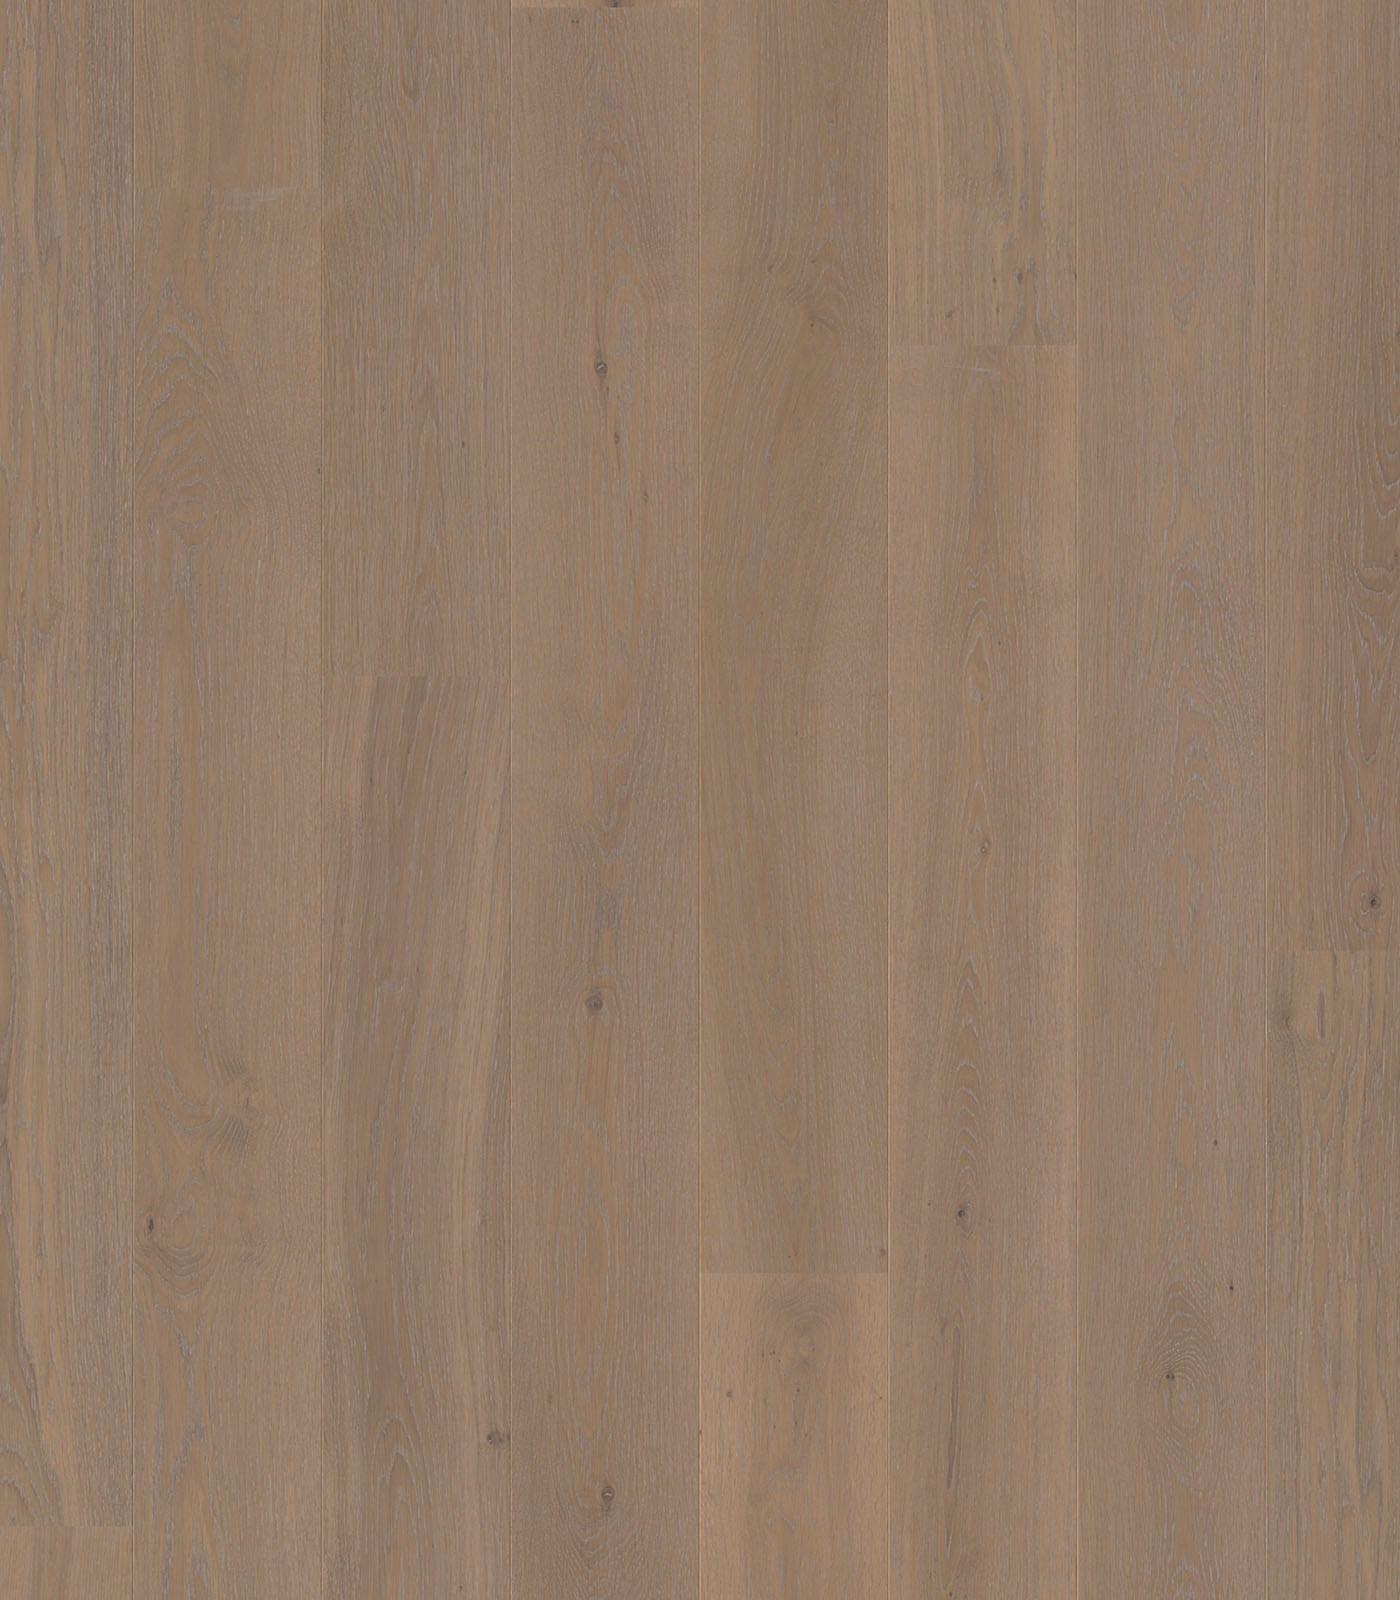 Moondust-European Oak Floors-Colors Collection-flat